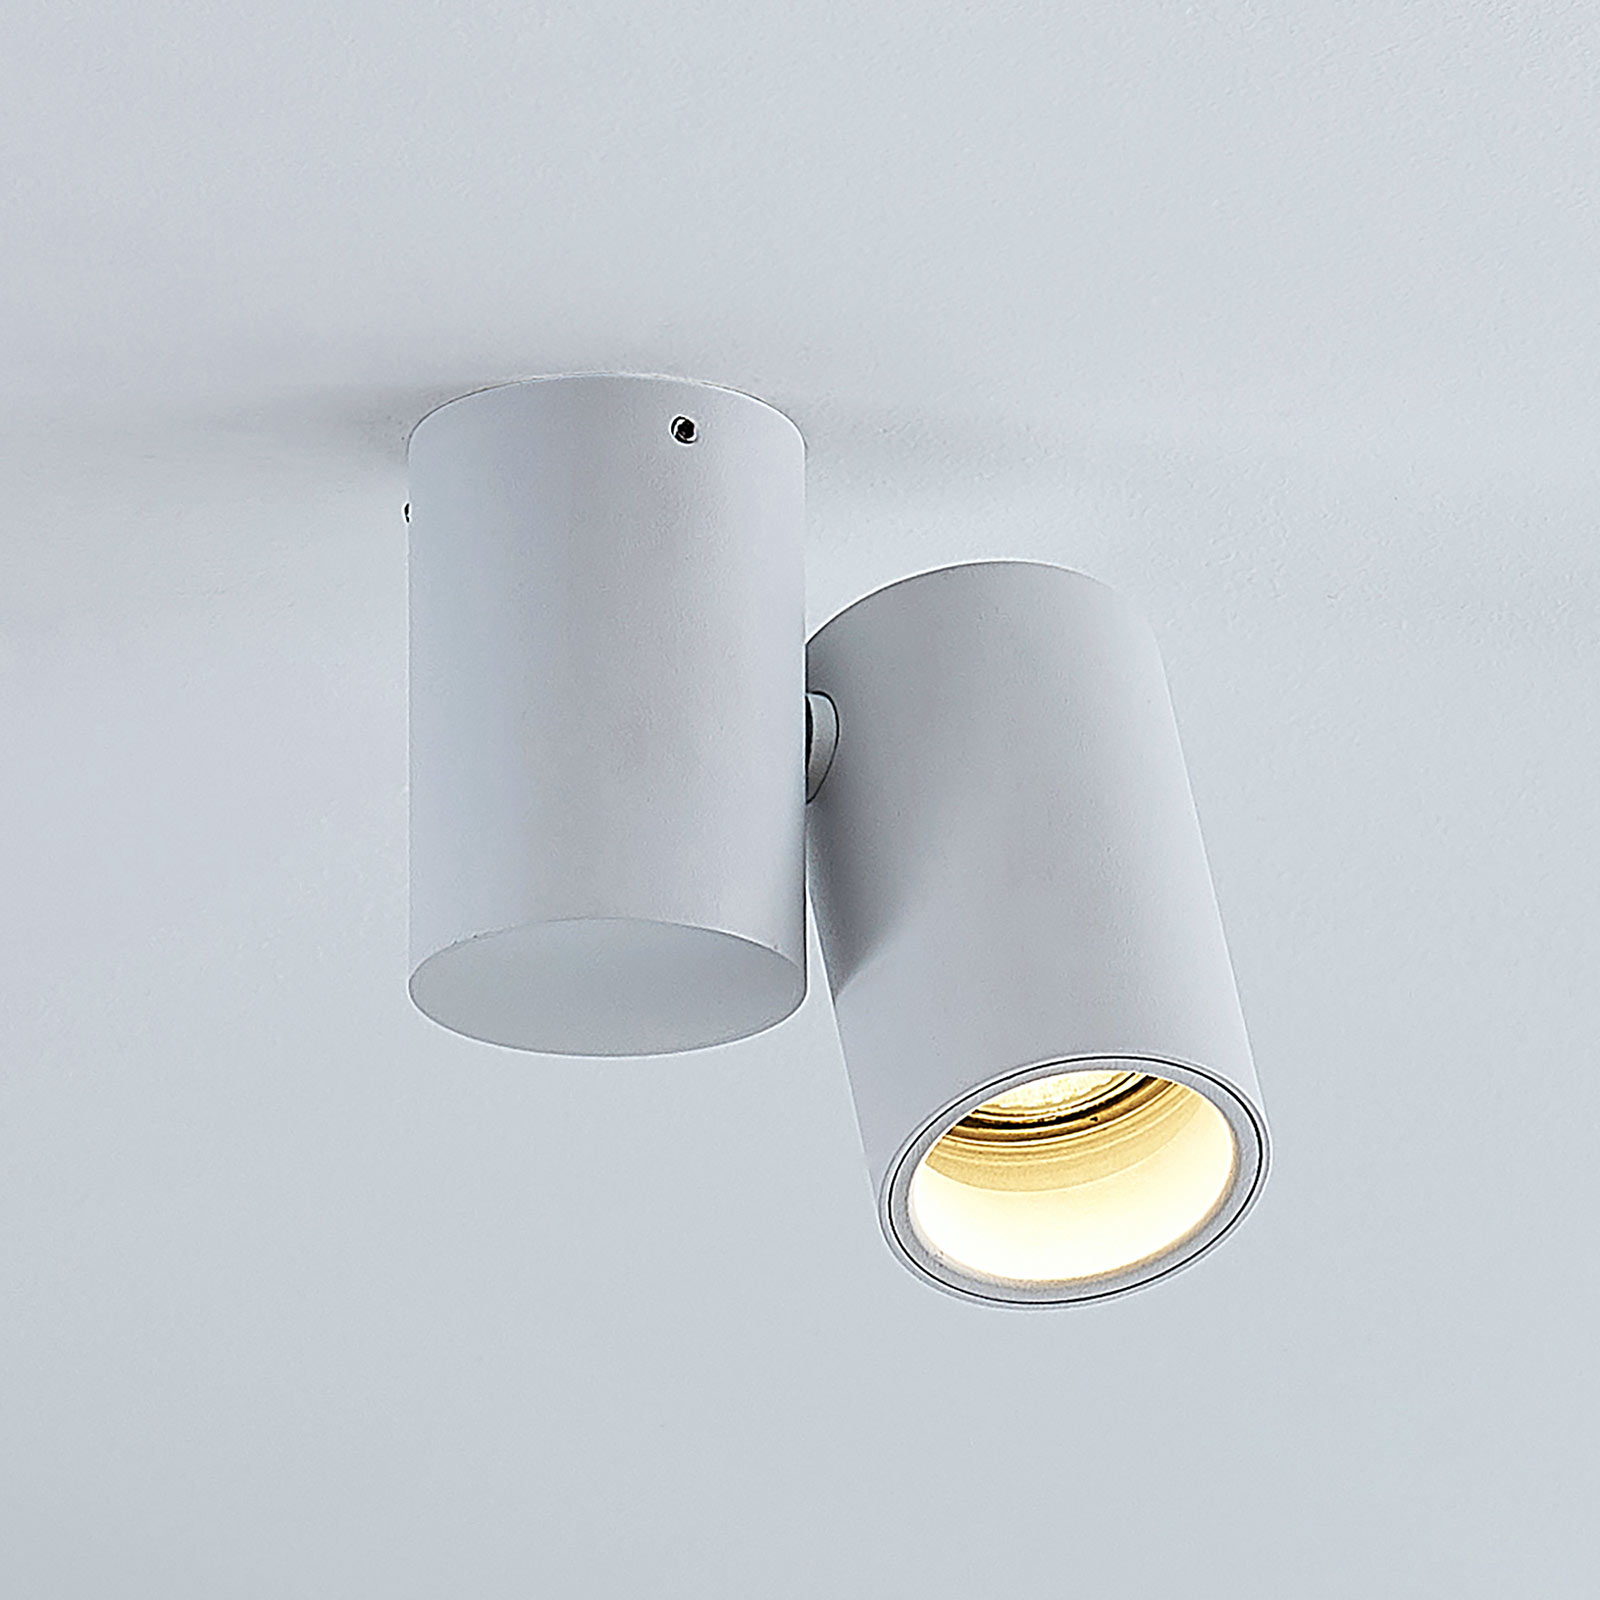 Plafondlamp Gesina, 1 lampje, wit